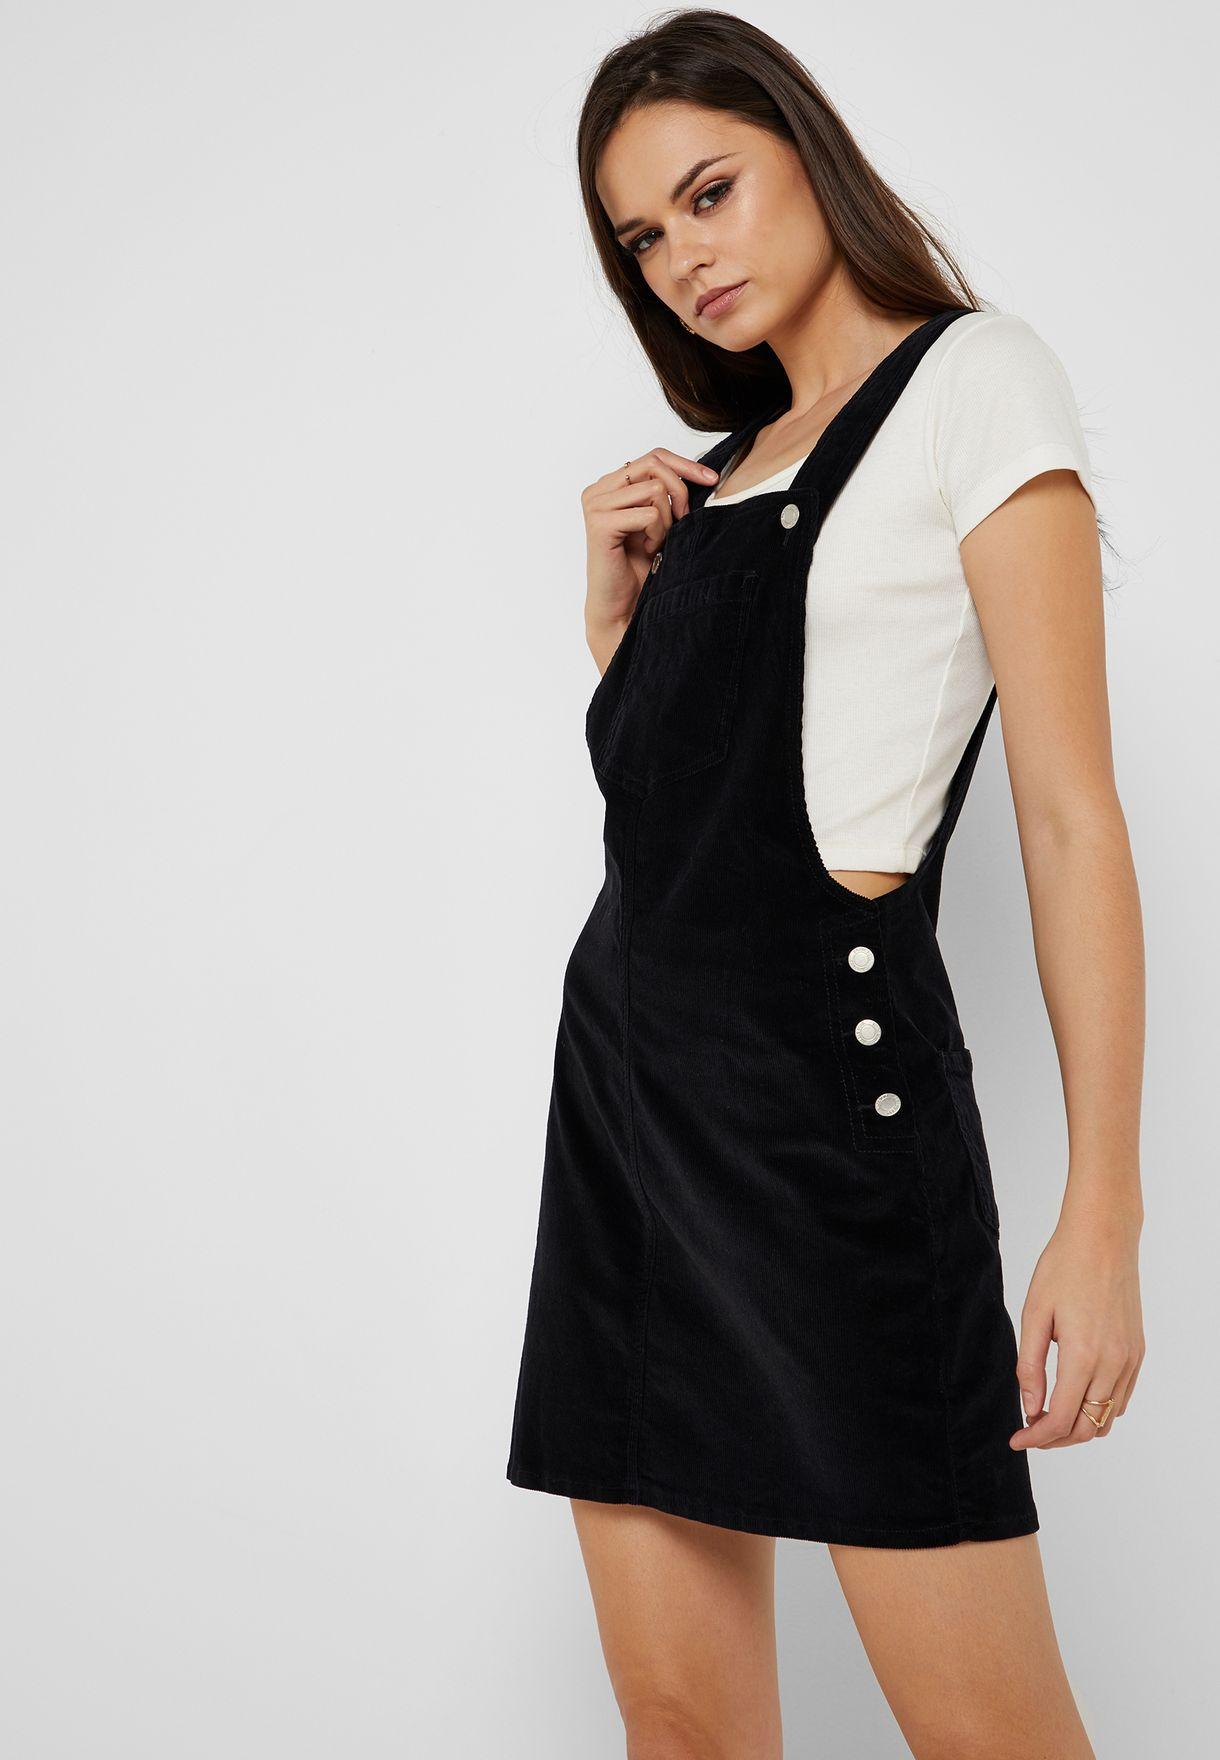 1f86a8e9687 Shop Ginger black Corduroy Dungaree Mini Dress LDRW-340ALEXABLA for ...